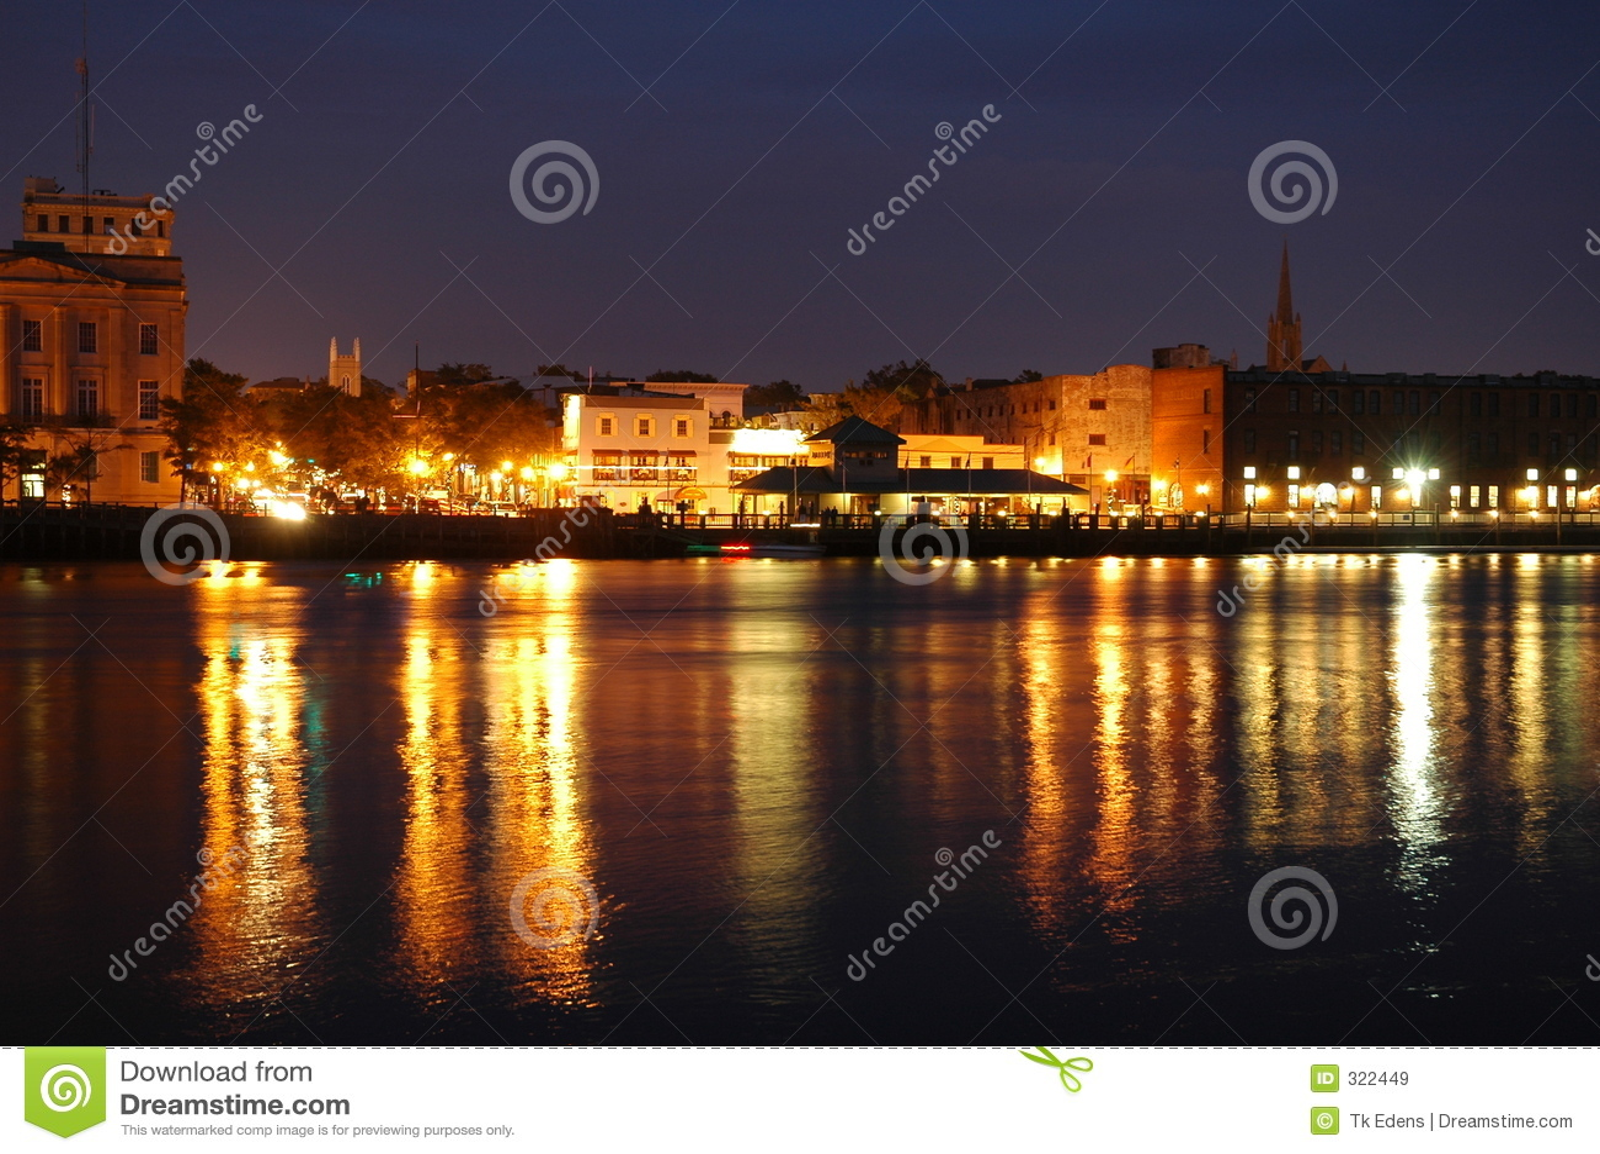 Night waterfront